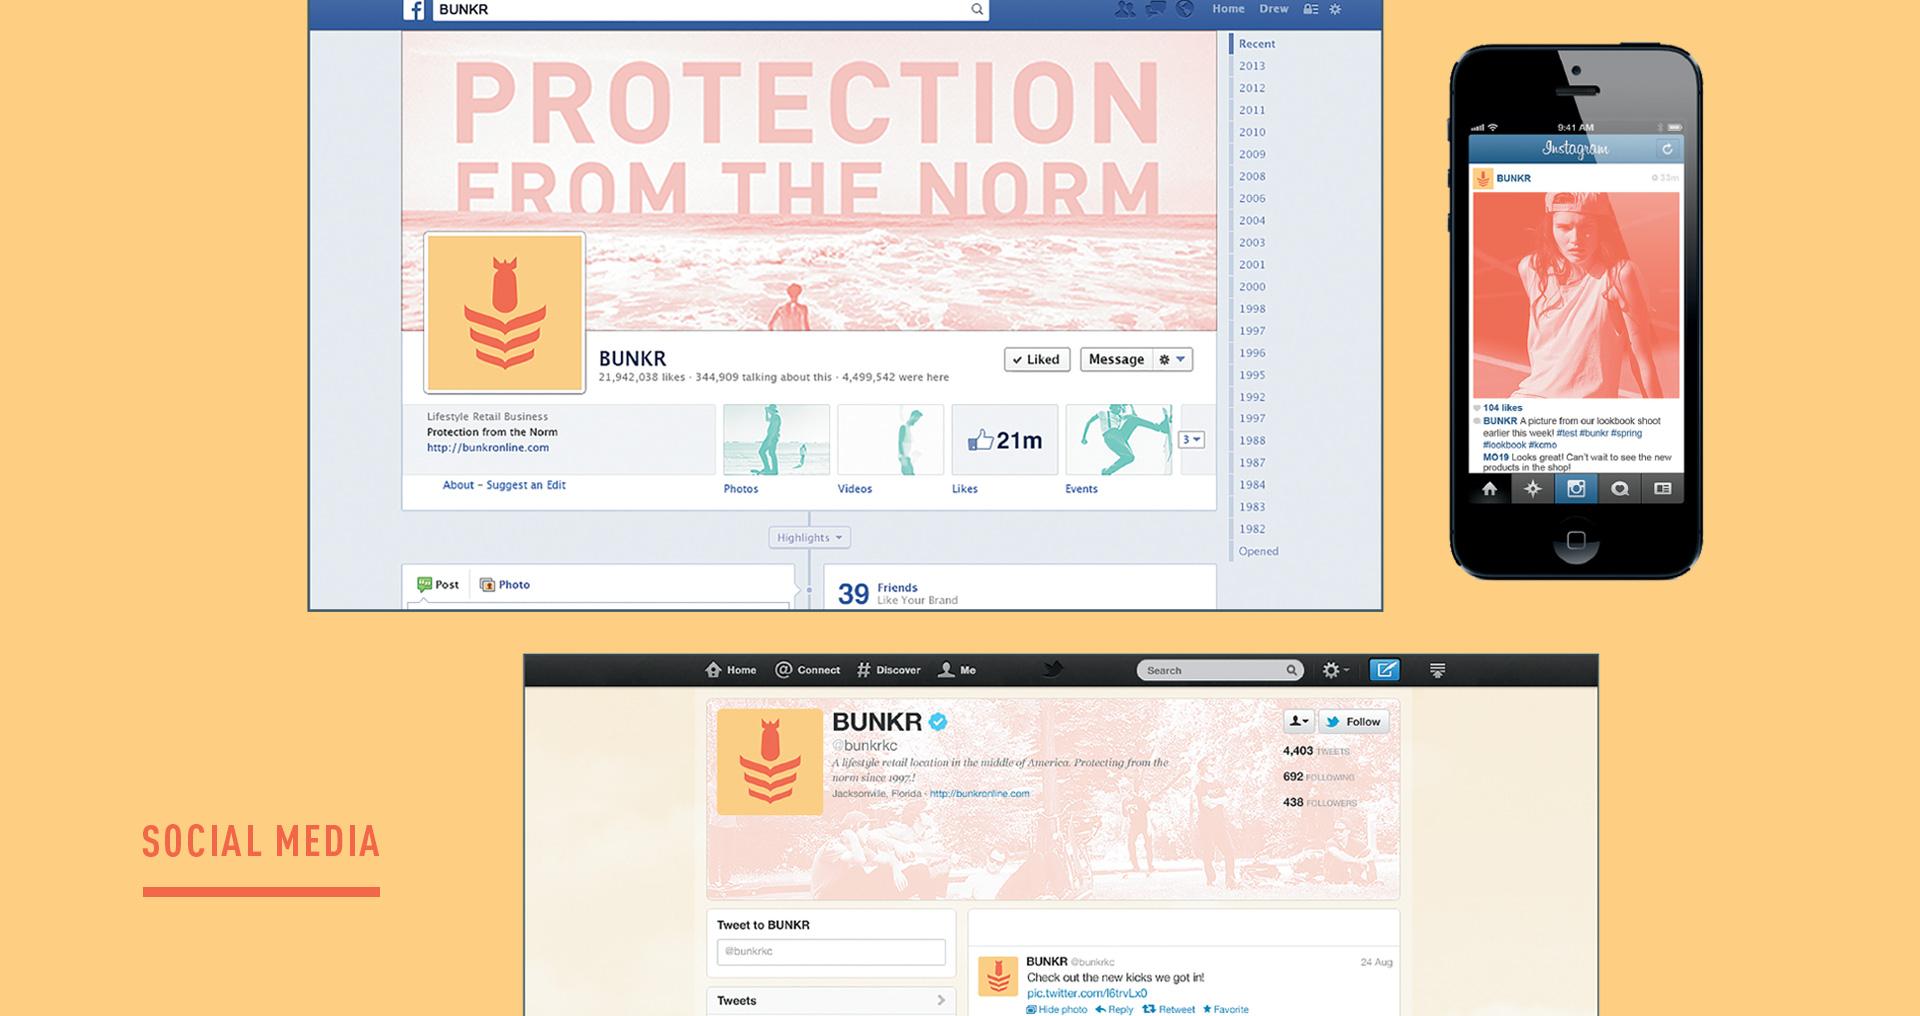 SSWeb-Bunkr-Social Media Overview